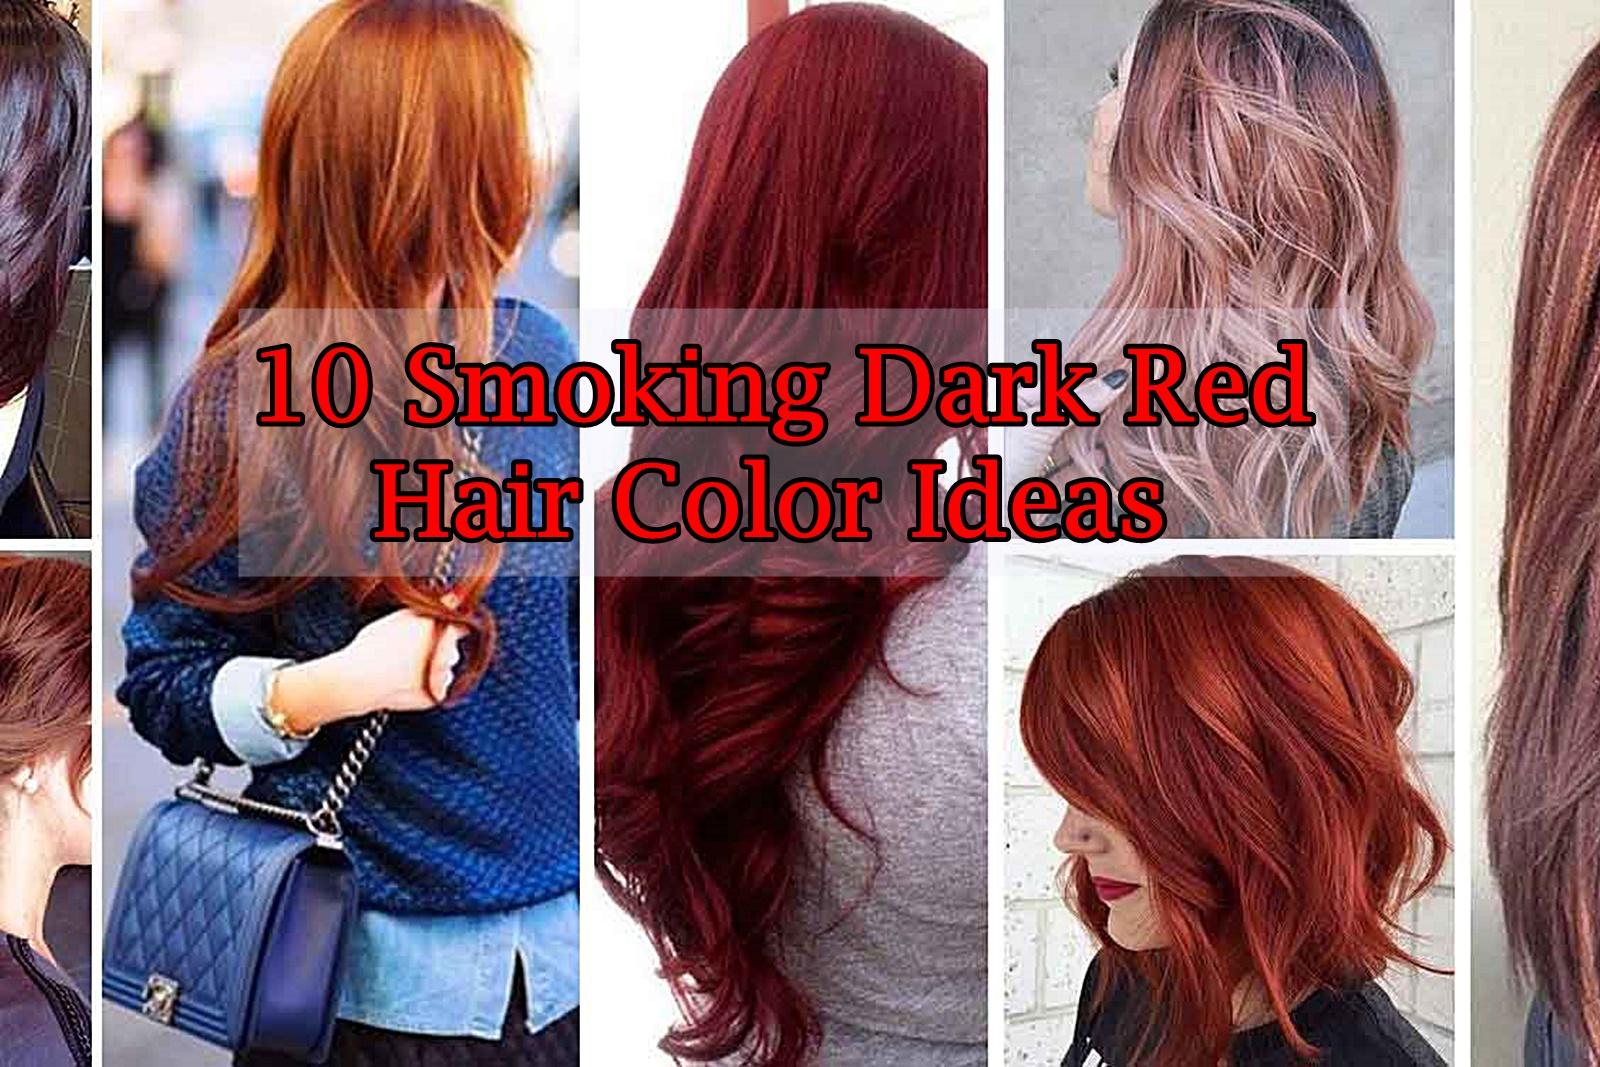 10 Smoking Dark Red Hair Color Ideas Hair Fashion Online